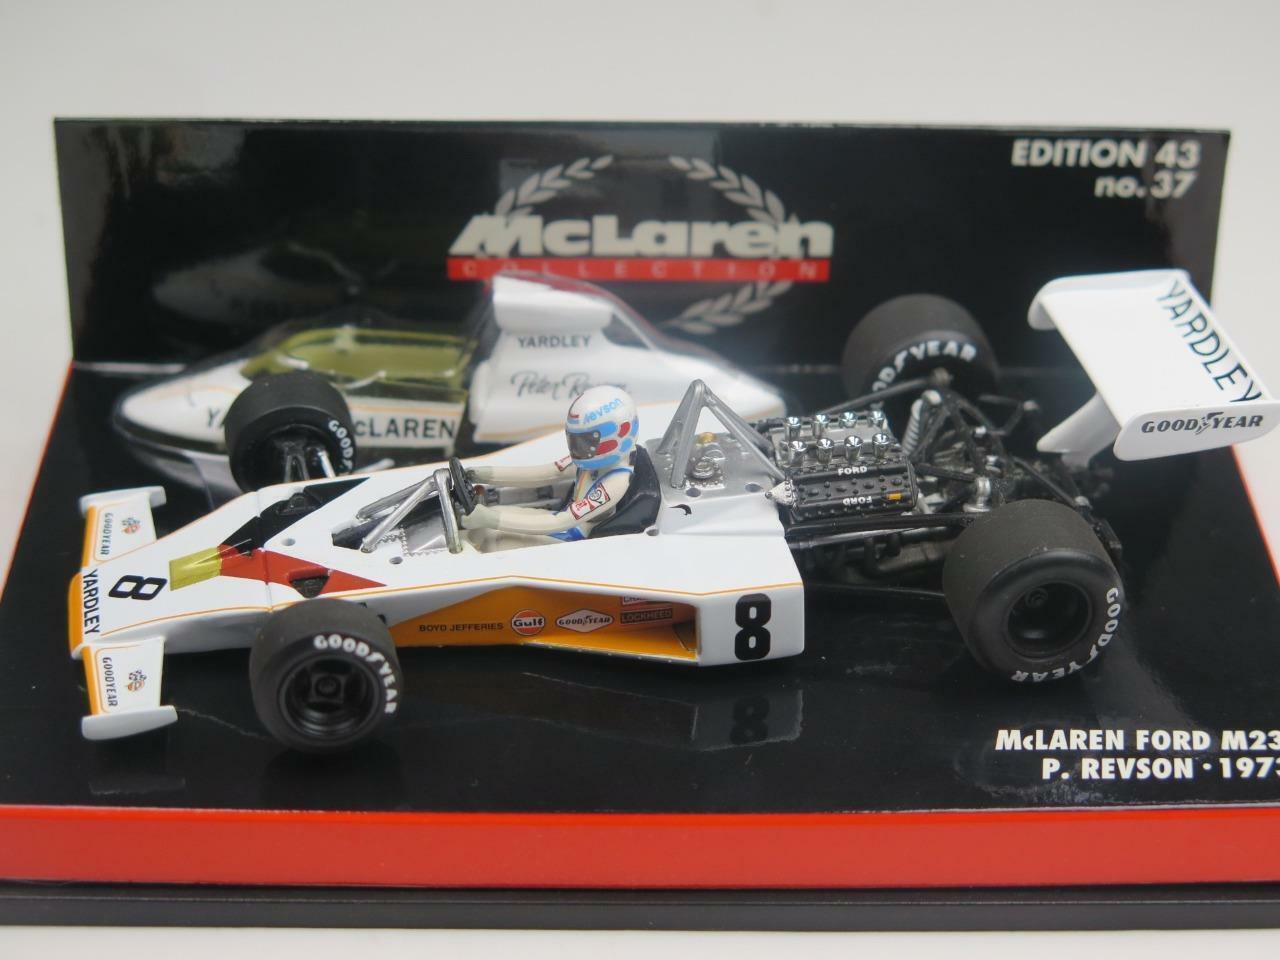 outlet Minichamps 1 43 43 43 FORMULA 1 Yardley McLaren M23 Nuovo di zecca Peter Revson 1973  consegna rapida